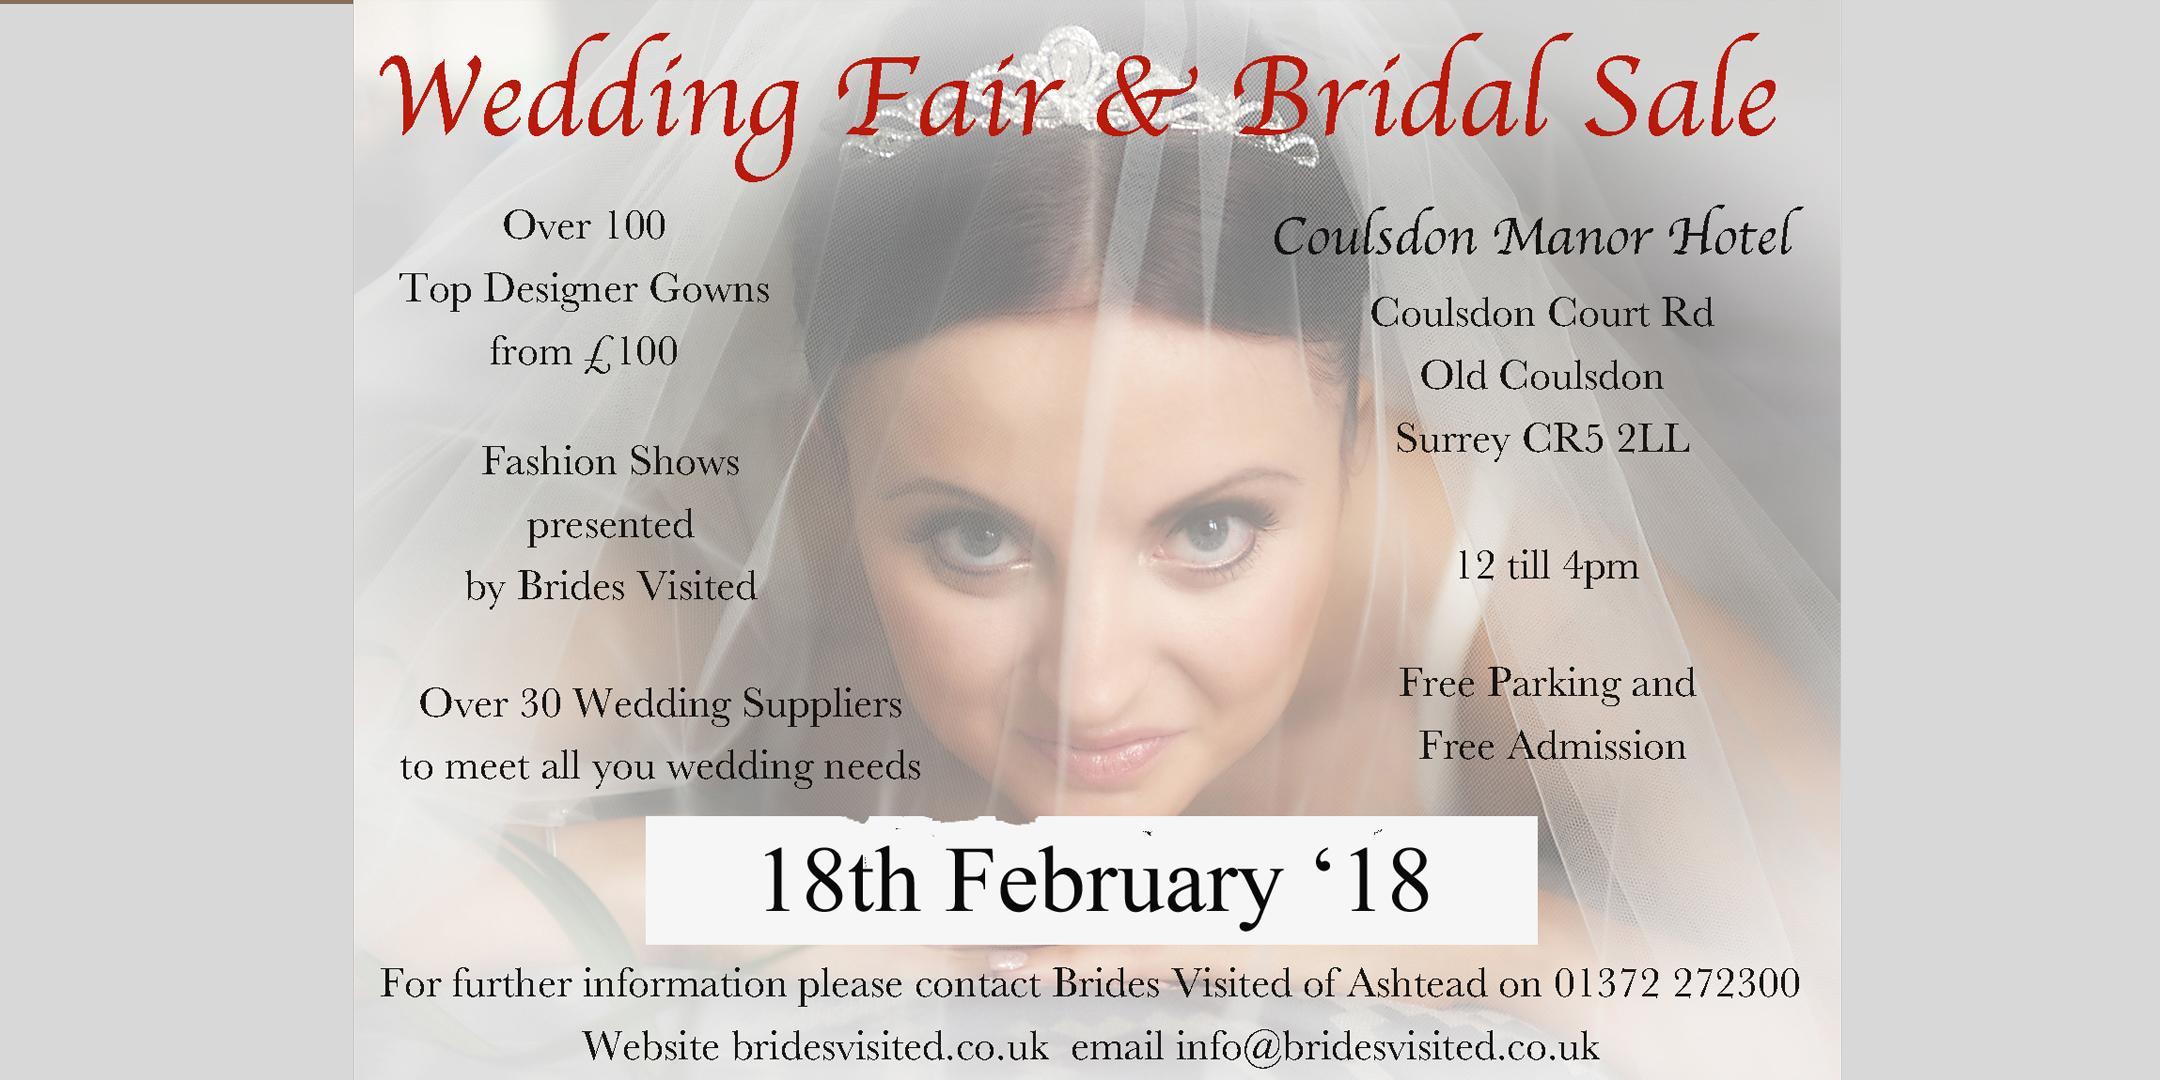 Coulsdon Manor Wedding fair & Bridal Sale